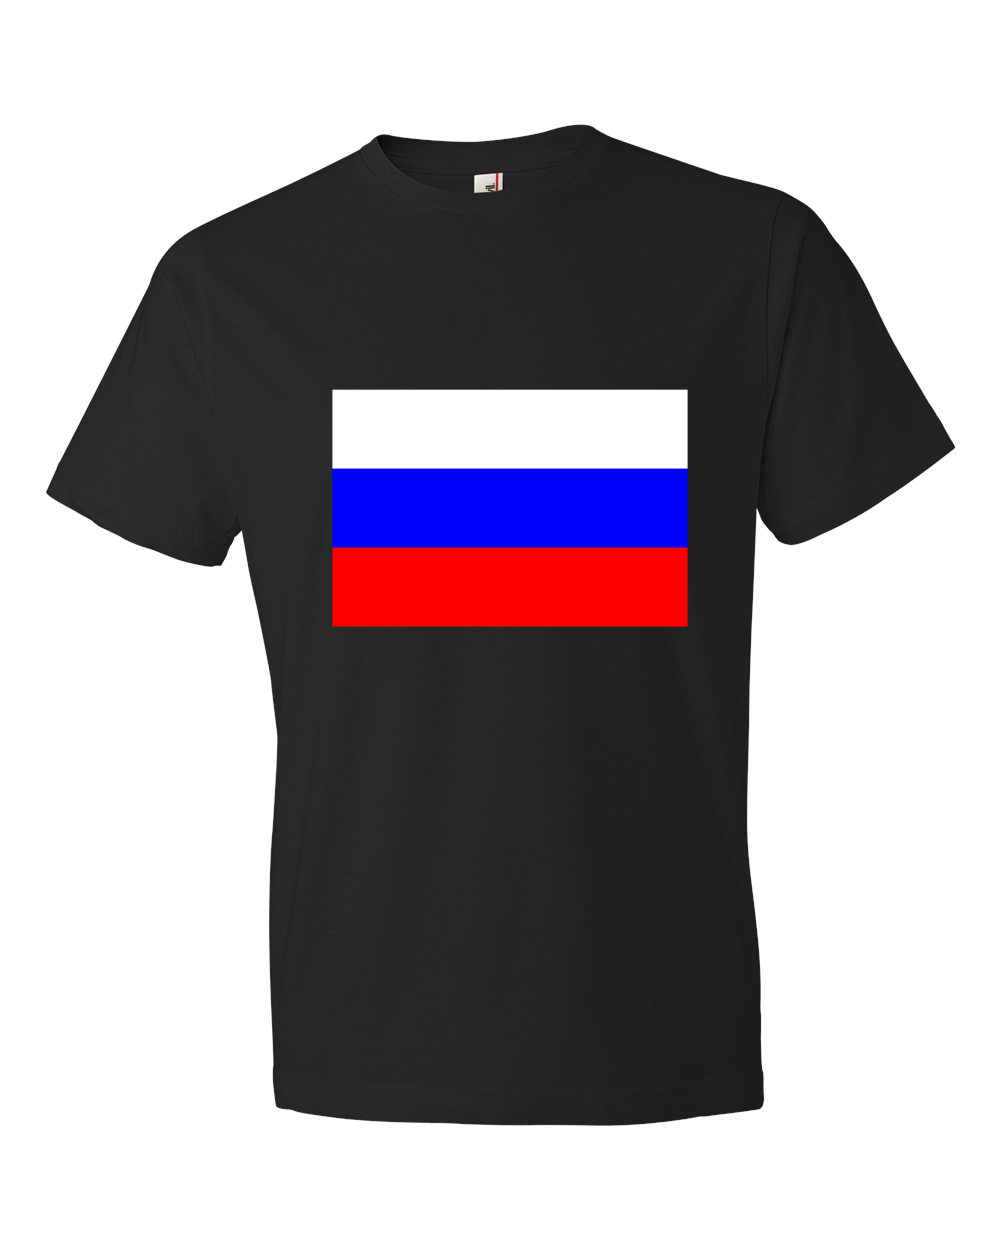 Russia-Lightweight-Fashion-Short-Sleeve-T-Shirt-by-iTEE.com